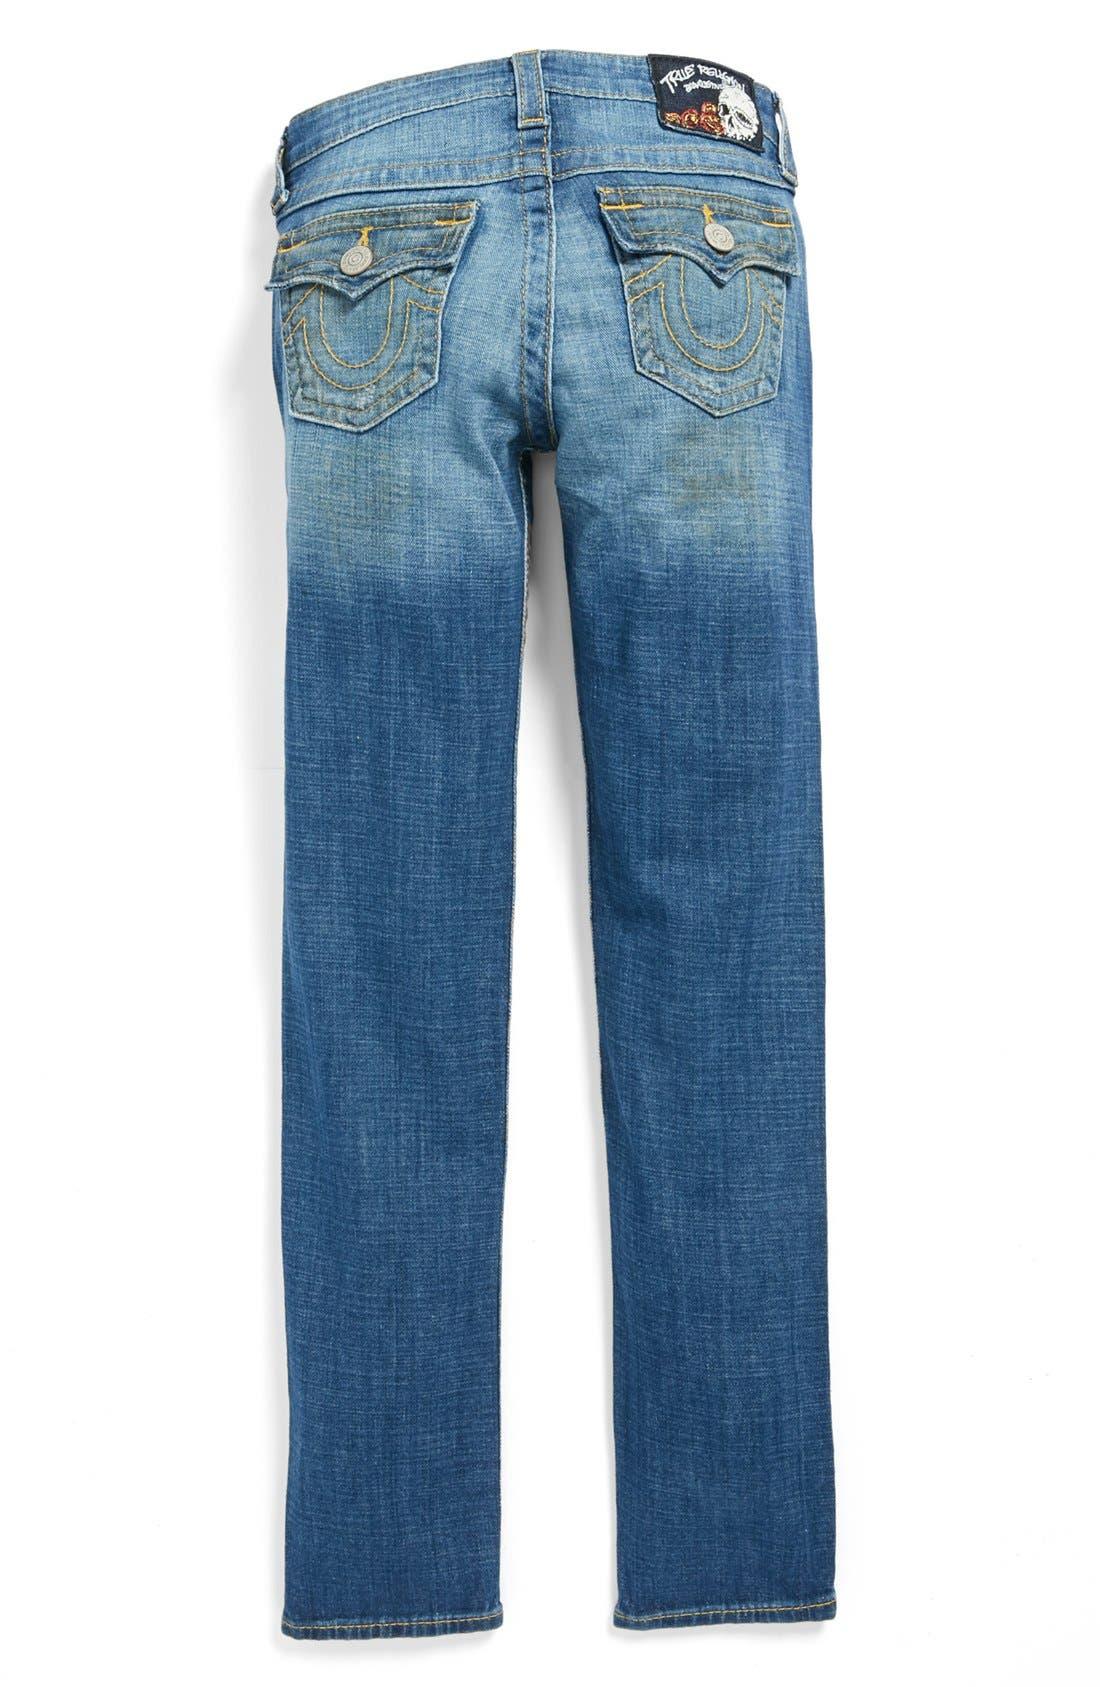 Main Image - True Religion Brand Jeans 'Julie' Straight Leg Jeans (Big Girls)